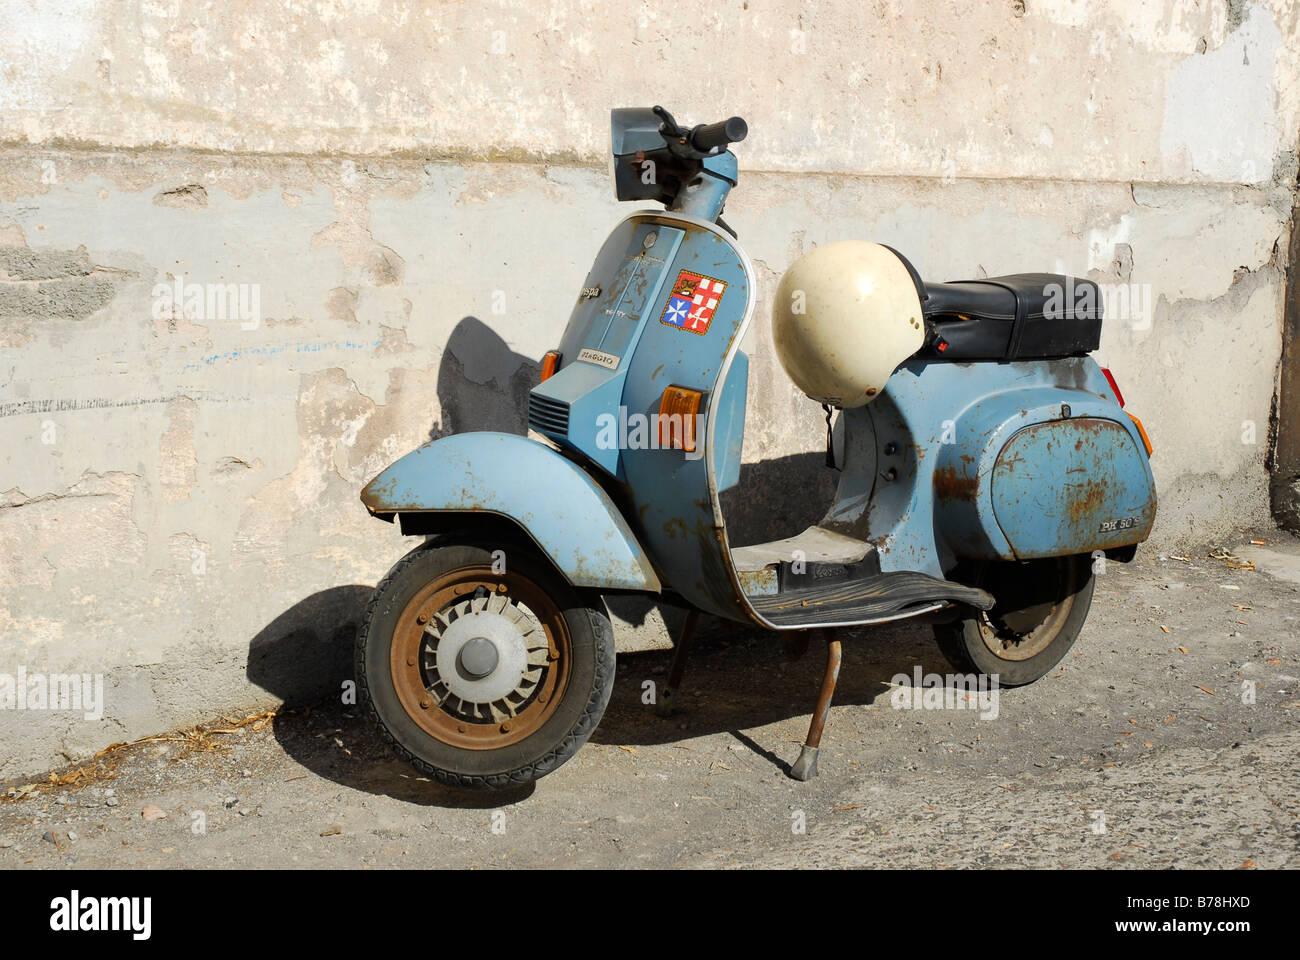 blue piaggio vespa motor scooter on stromboli island, aeolian or